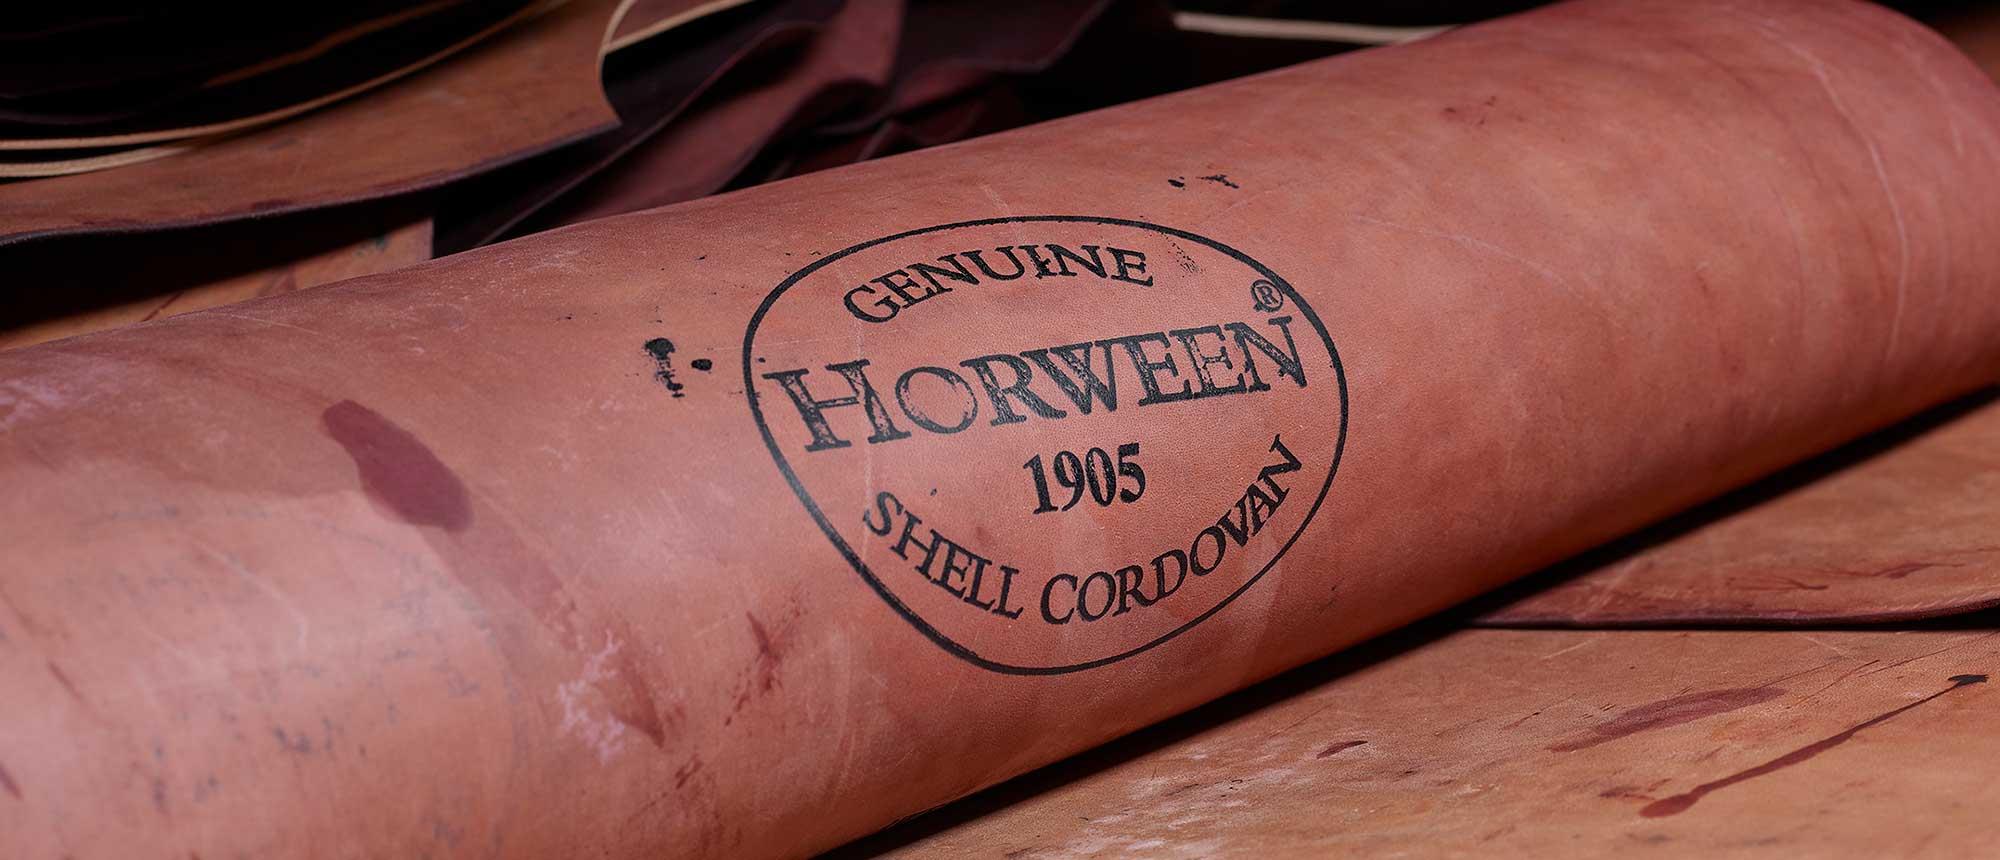 Horween shell cordovan